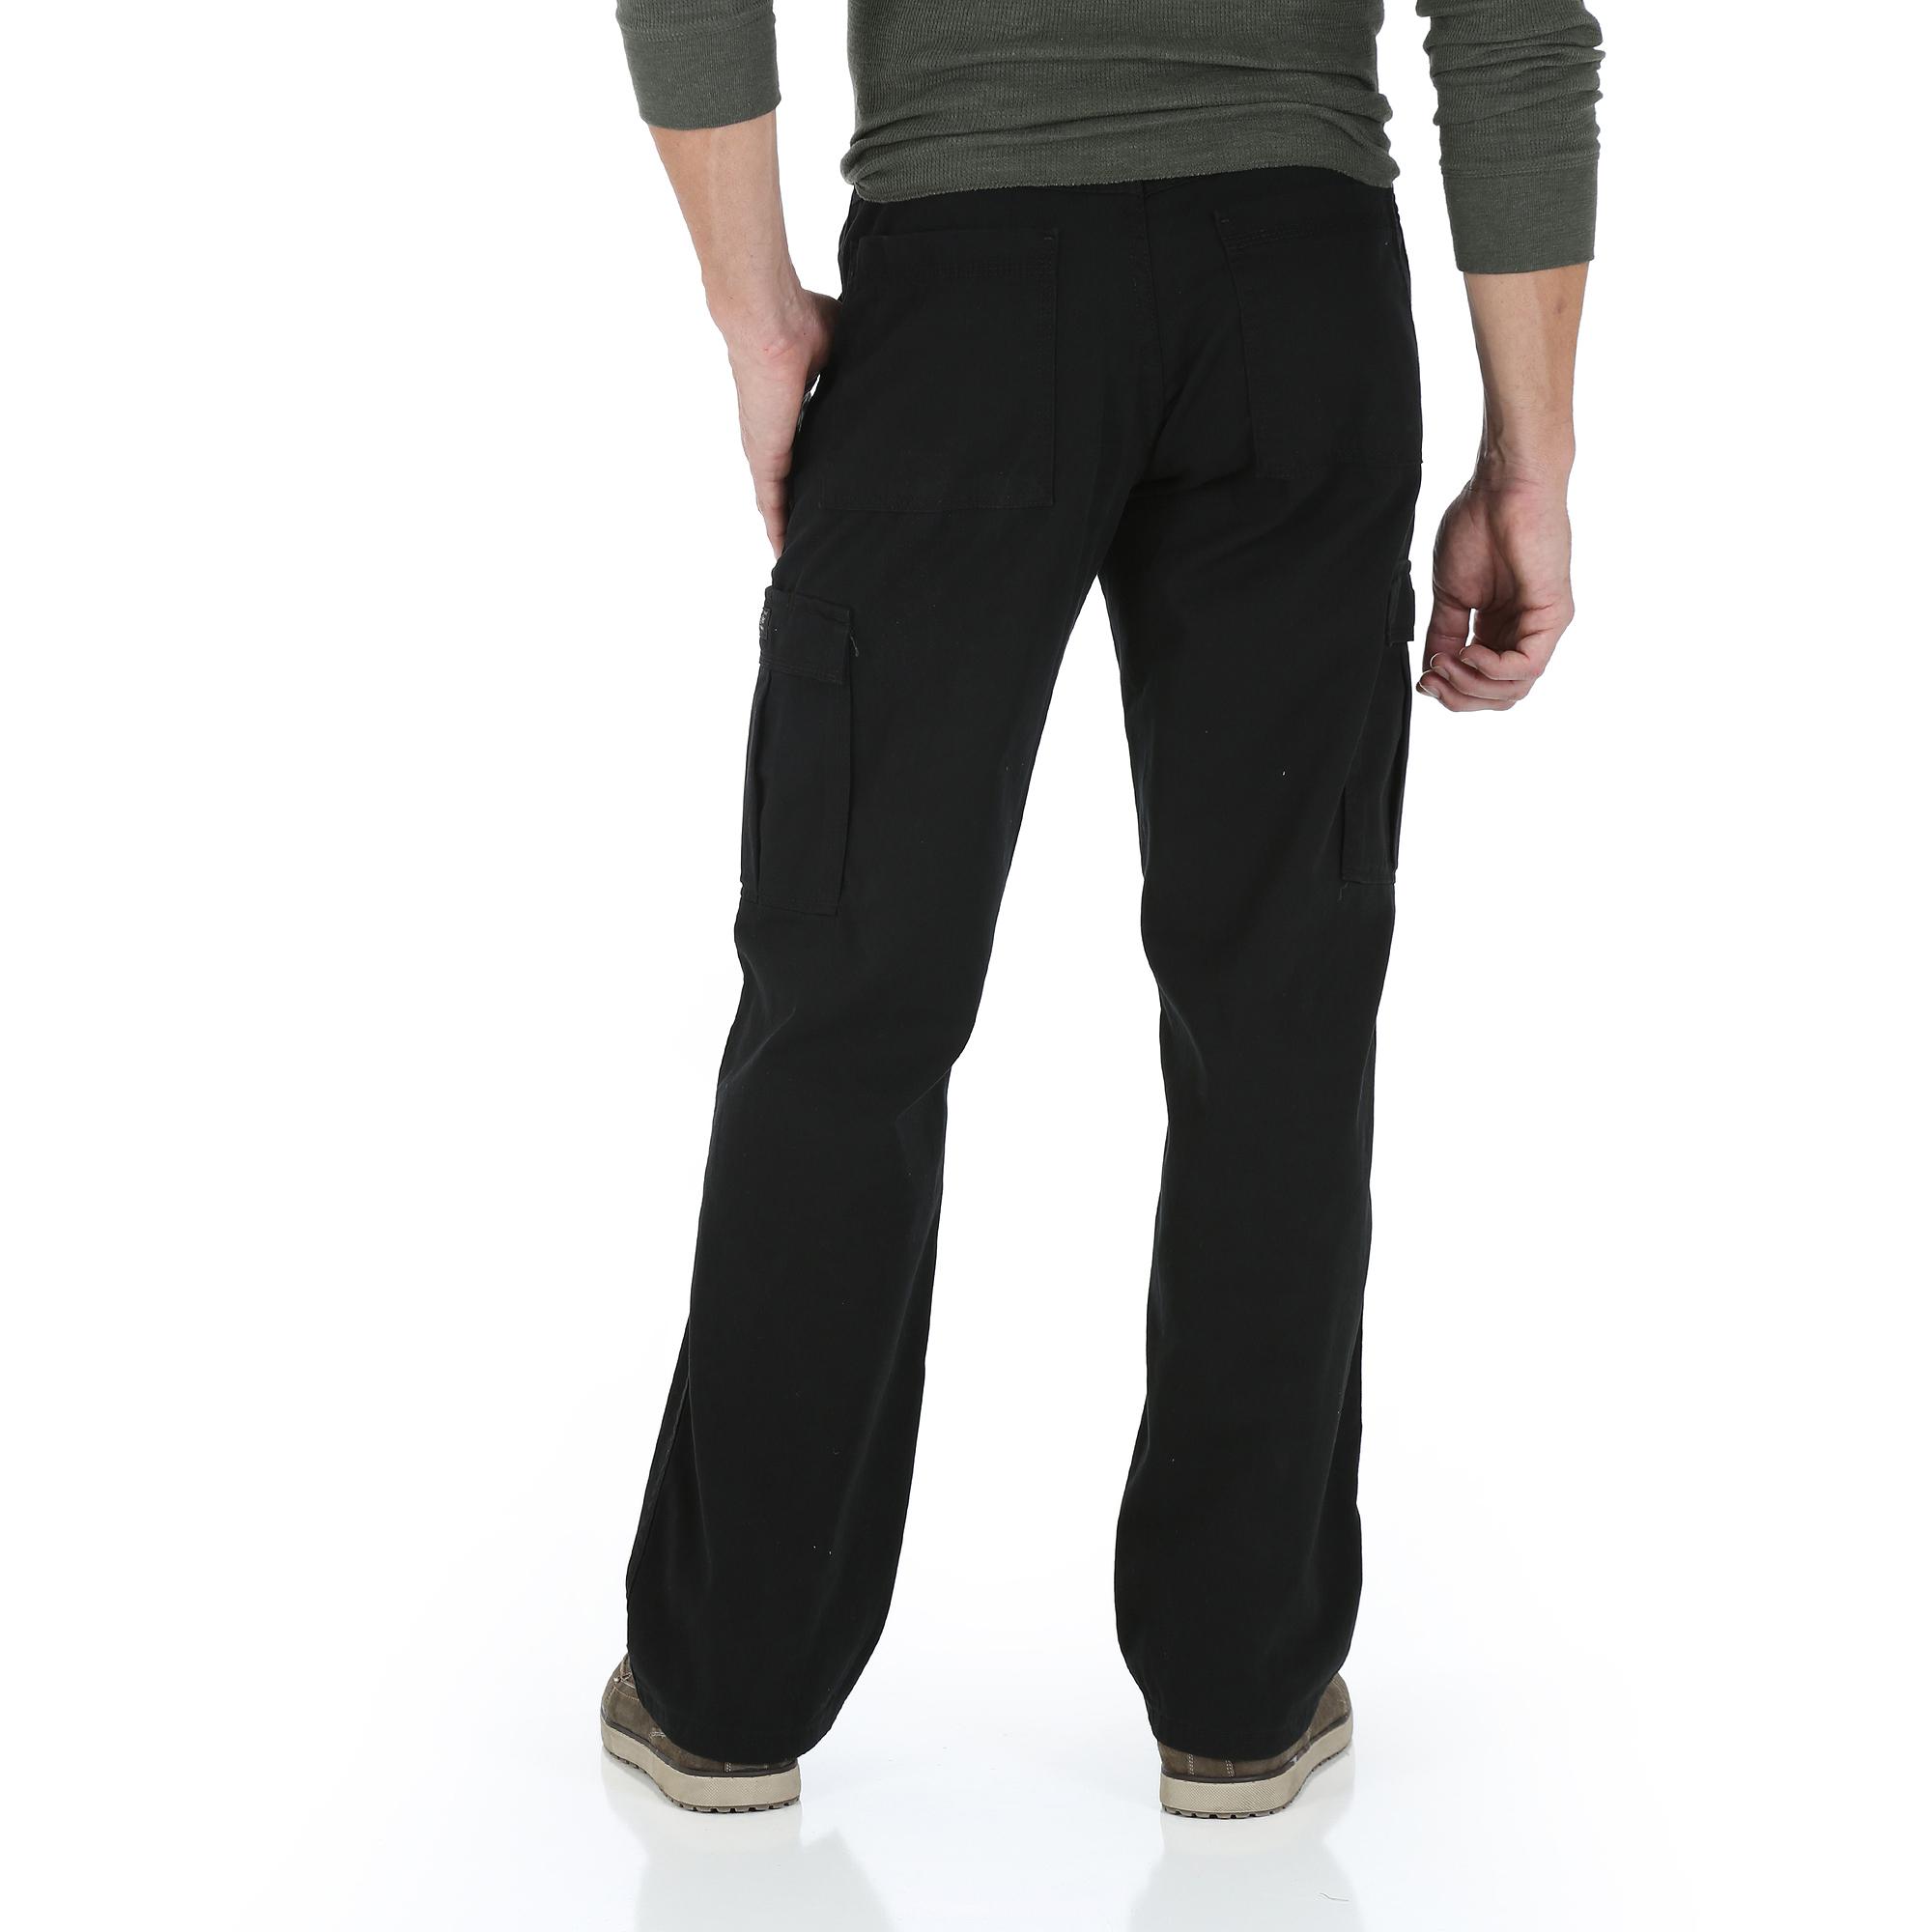 cargo jeans wrangler - menu0027s cargo pants or jeans, 2 pack - walmart.com whloltx